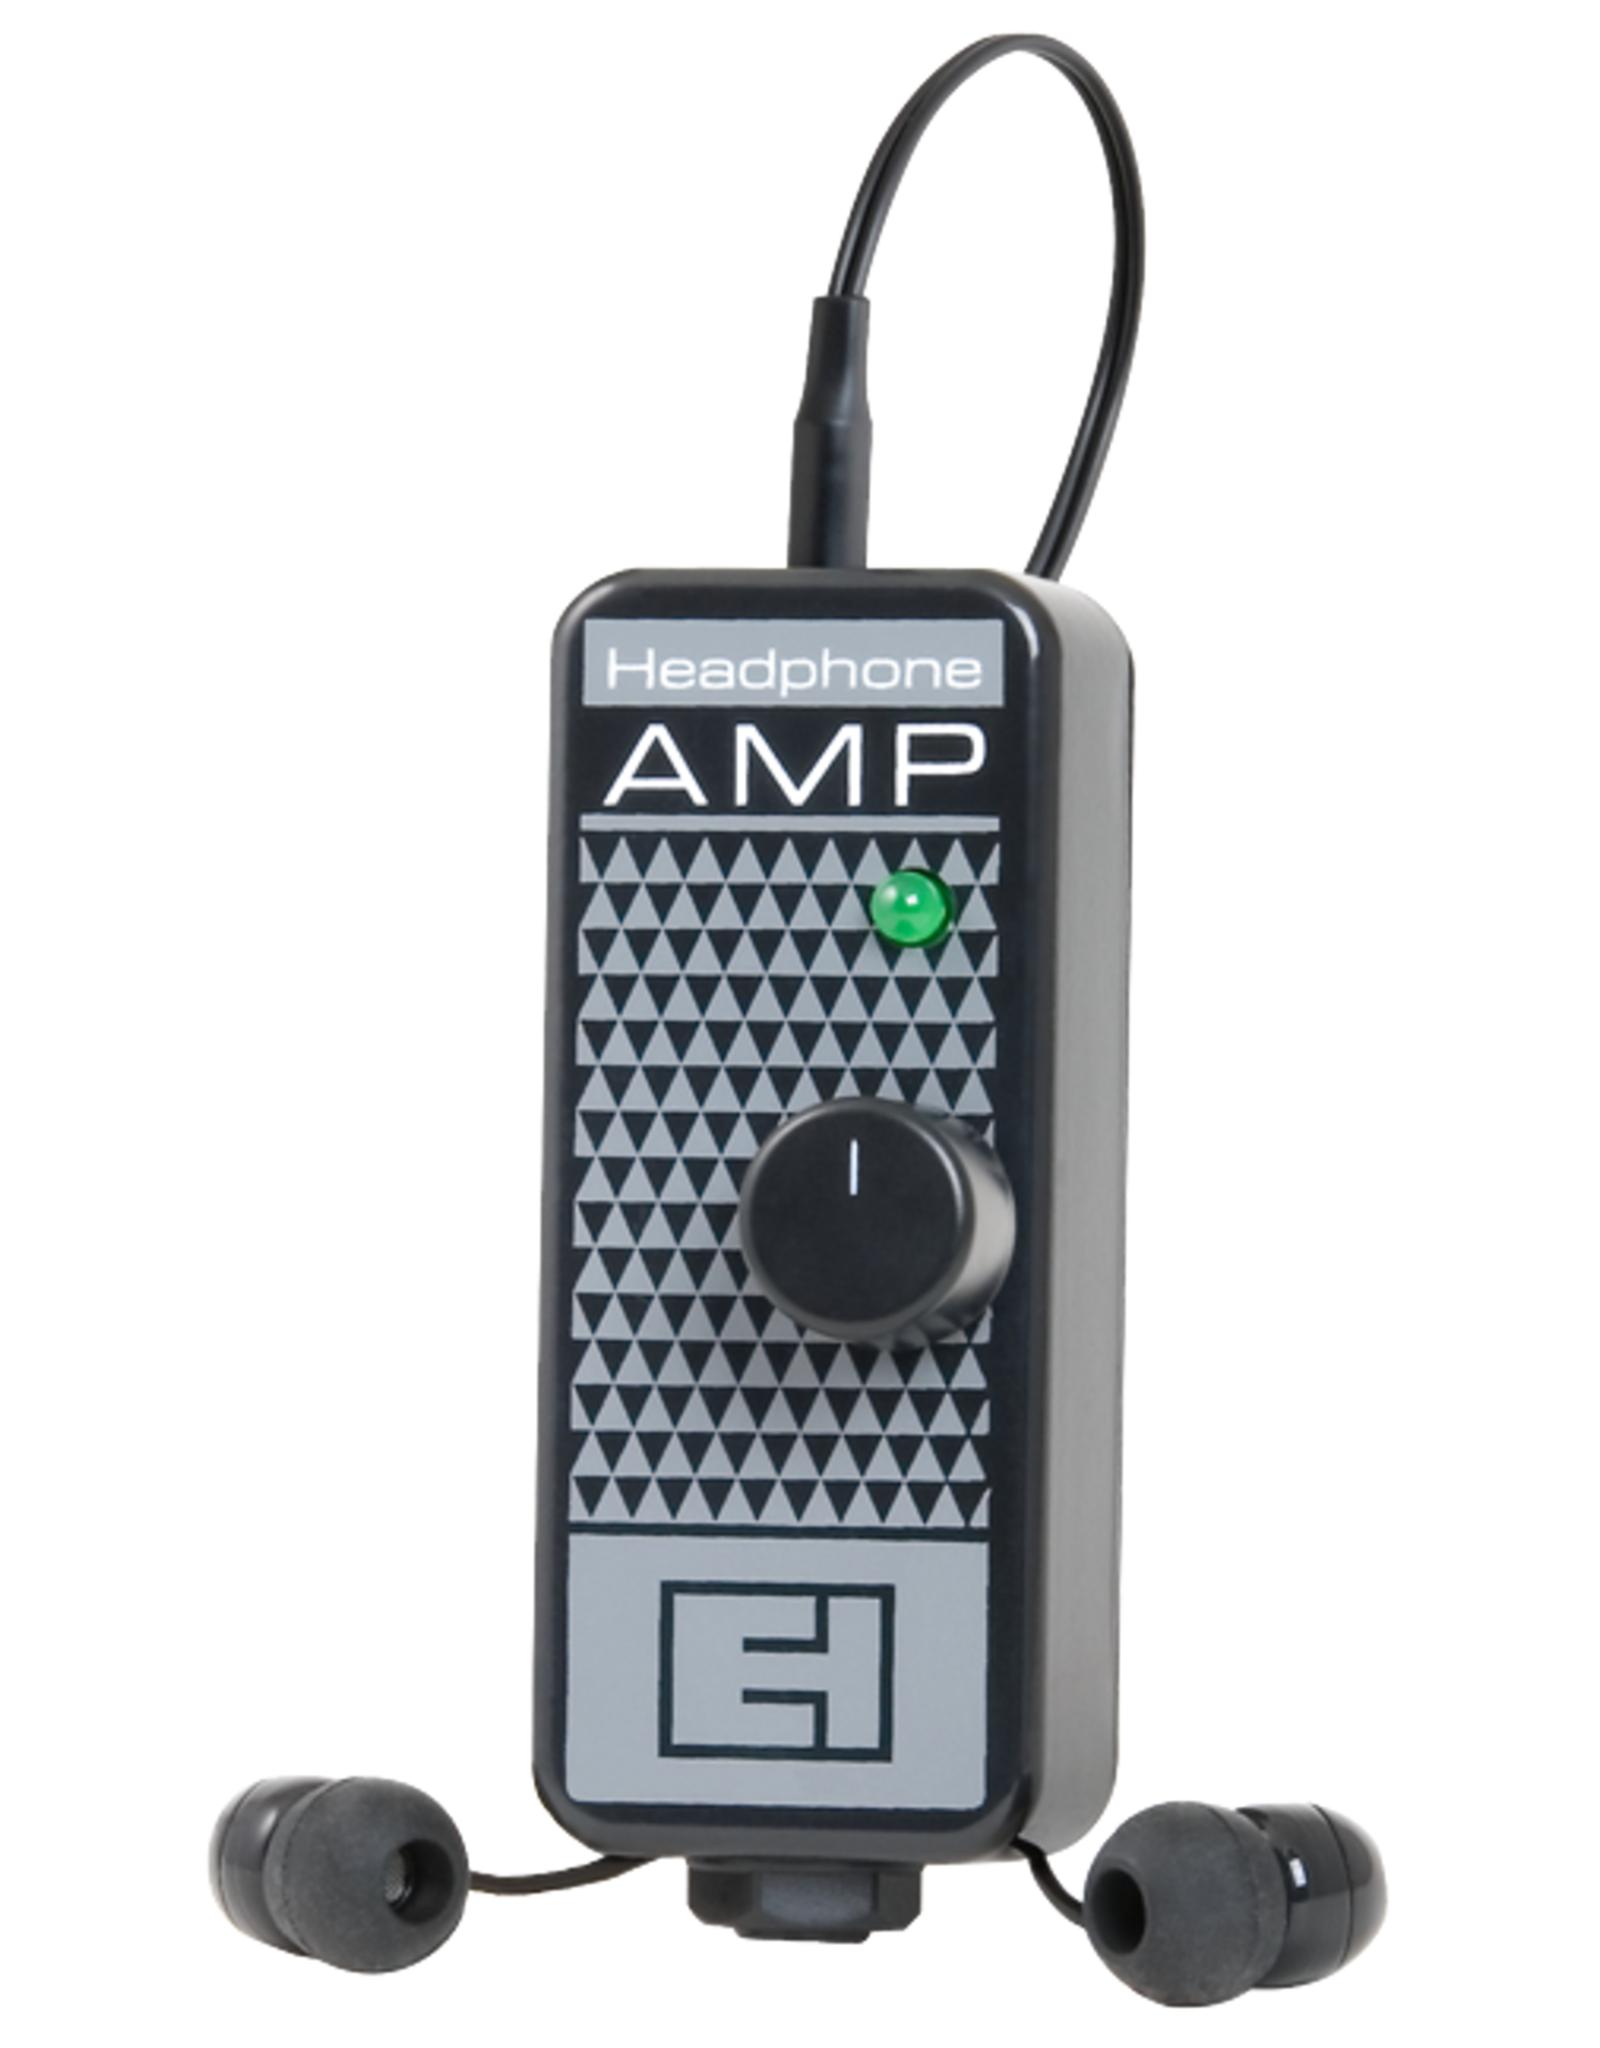 Electro-Harmonix HEADPHONE AMP Portable Practice Amp, Battery included